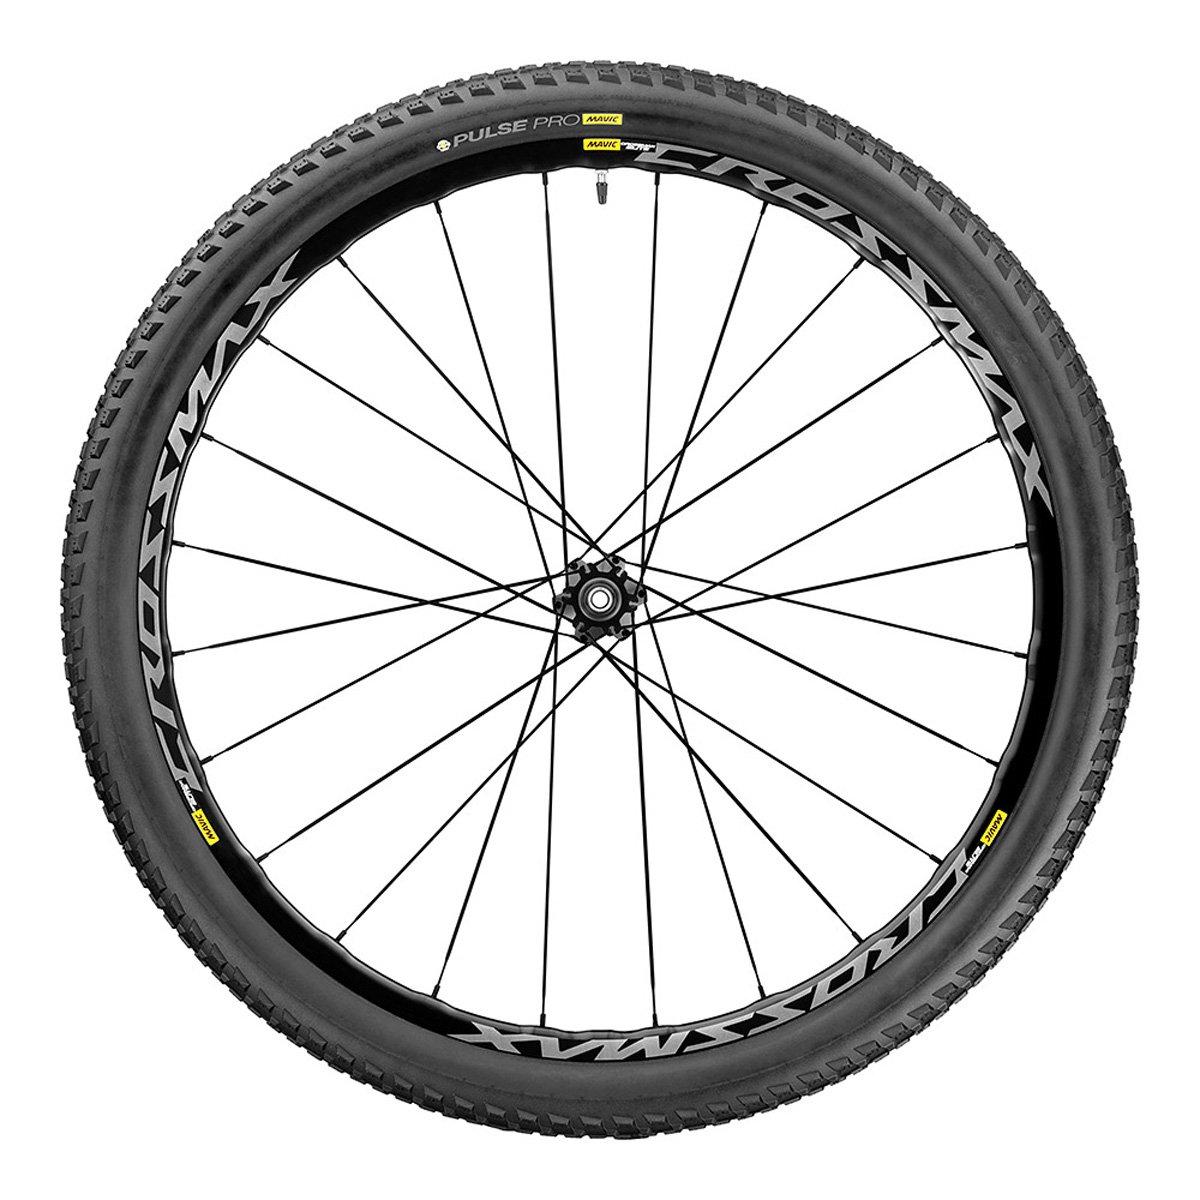 Mavic 2017 Crossmax Elite Cross Countryマウンテン自転車ホイールタイヤシステム – 背面ブラック – 背面Boost – 27.5 X 2.25 )   B01LYDF2JZ